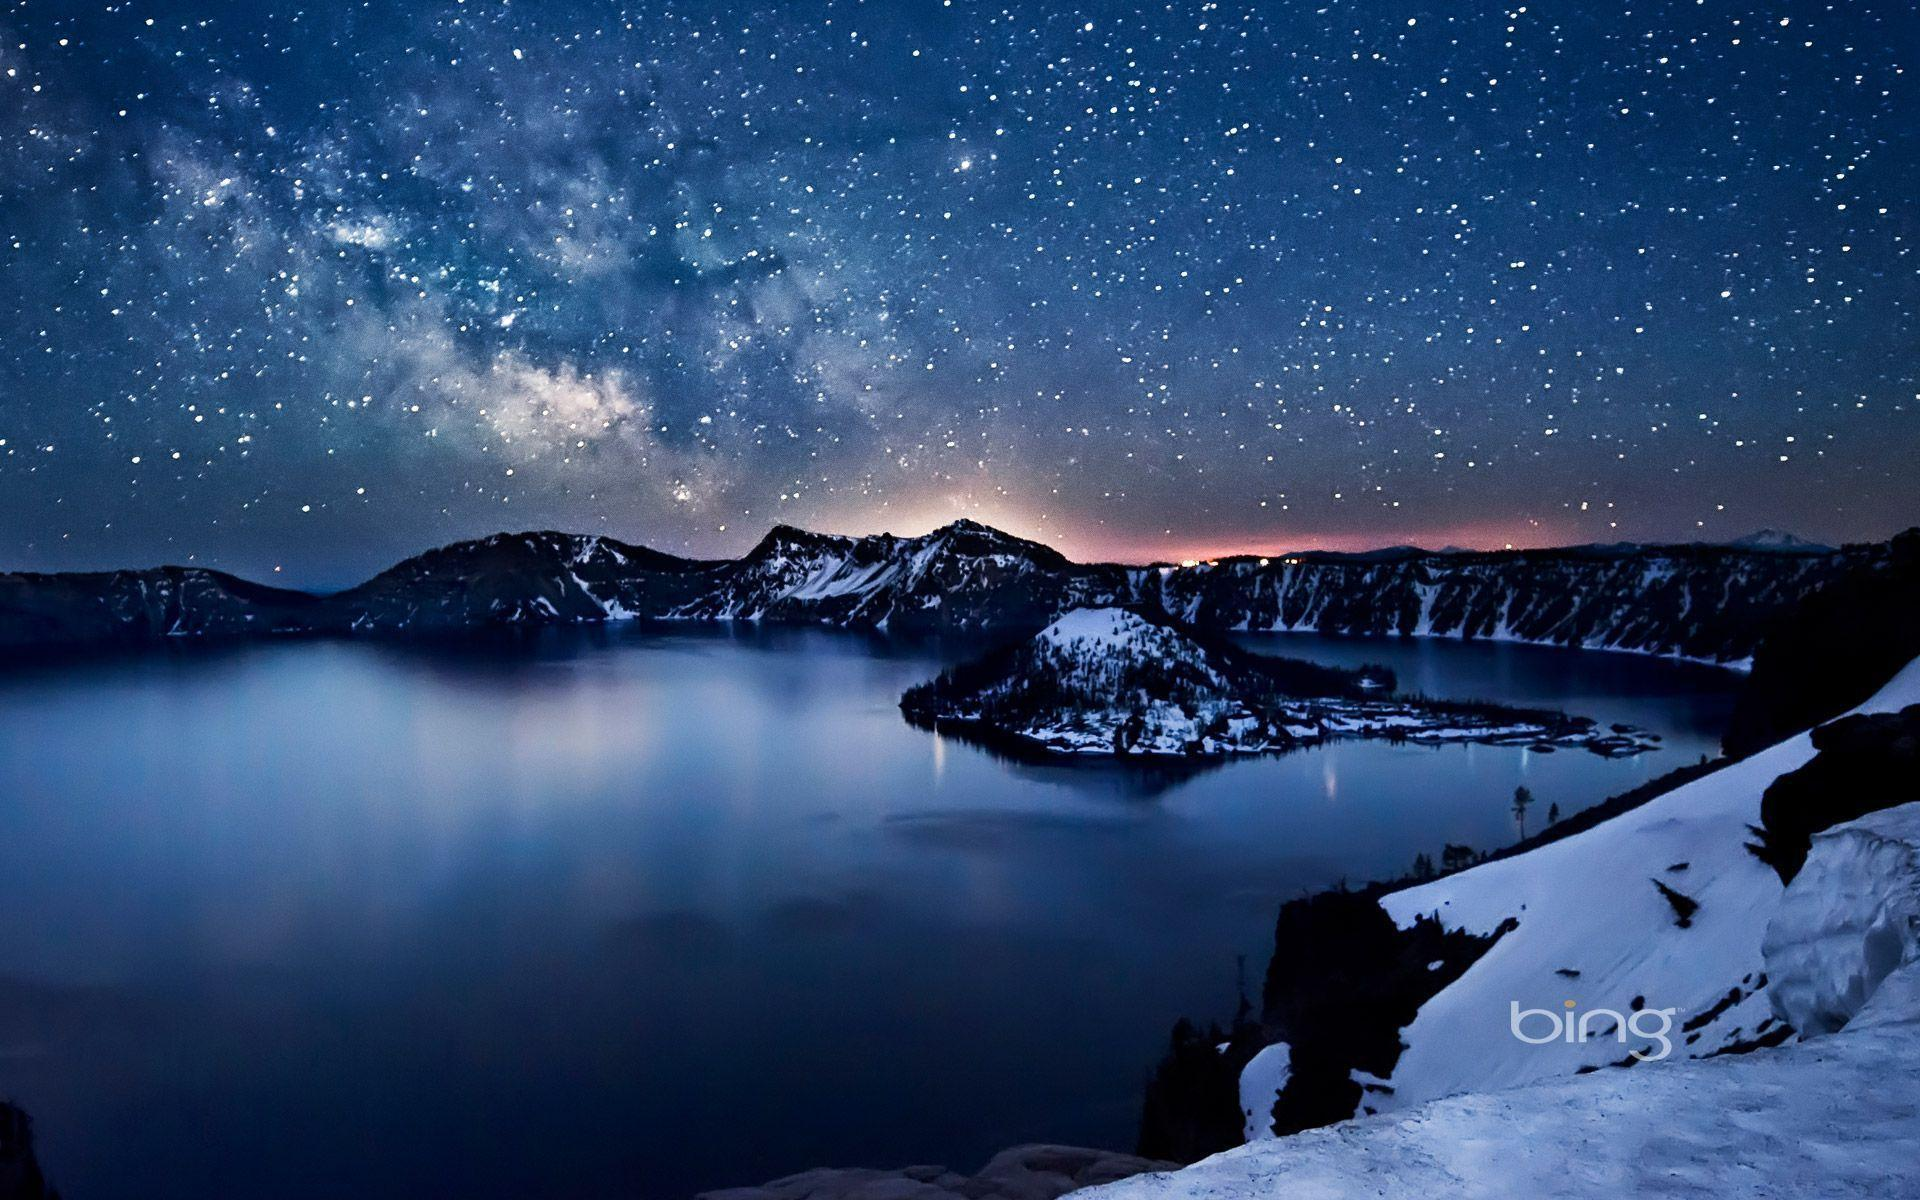 Oregon Wallpapers Hd: Crater Lake Wallpapers